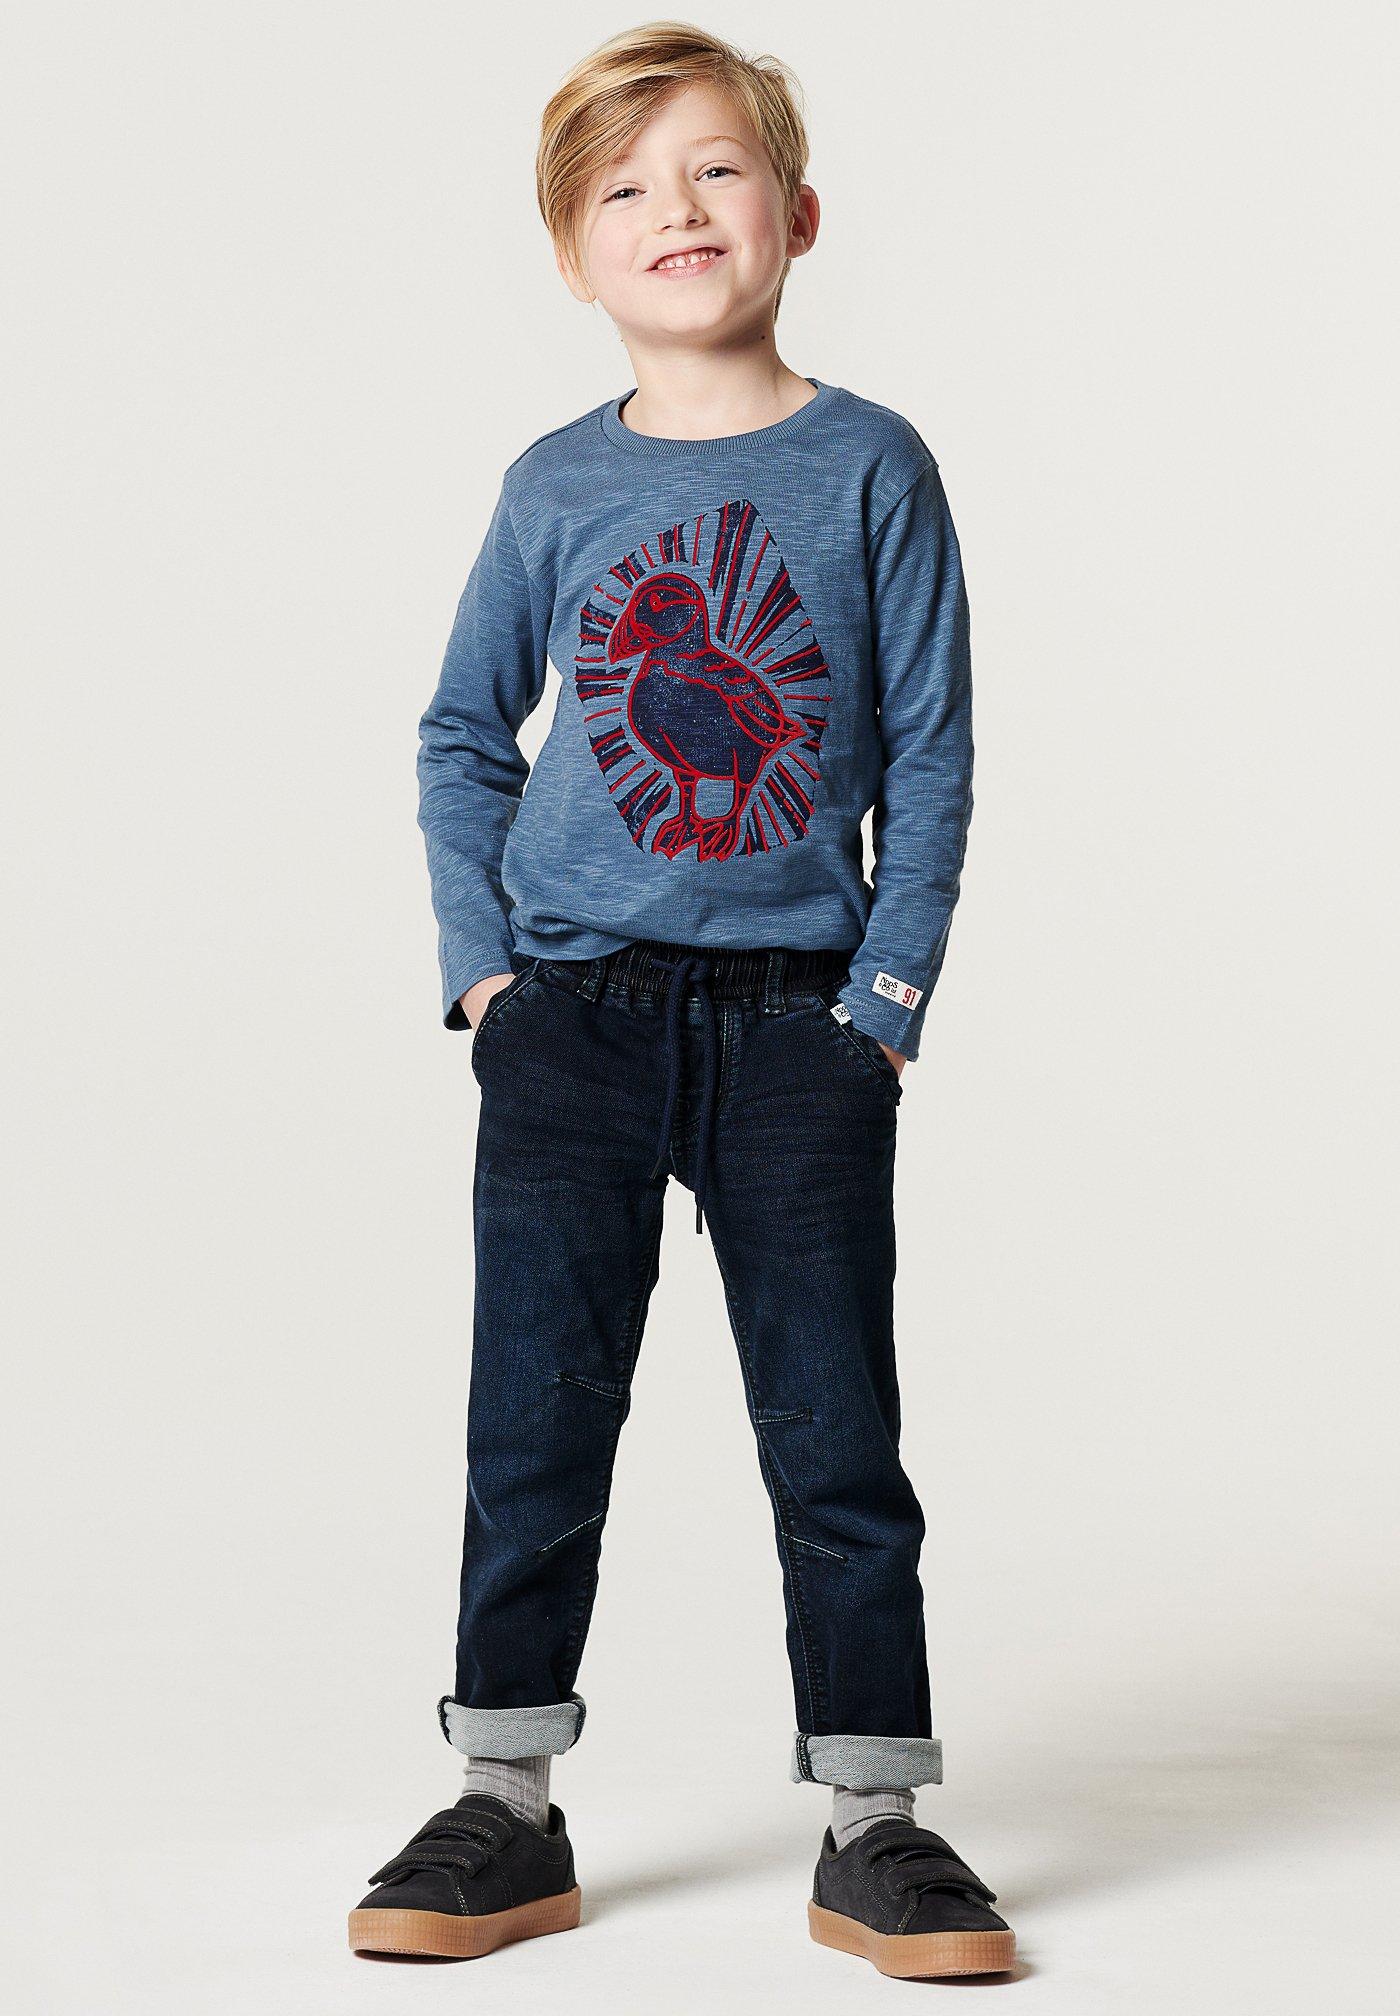 Bambini BAGUIO - Maglietta a manica lunga